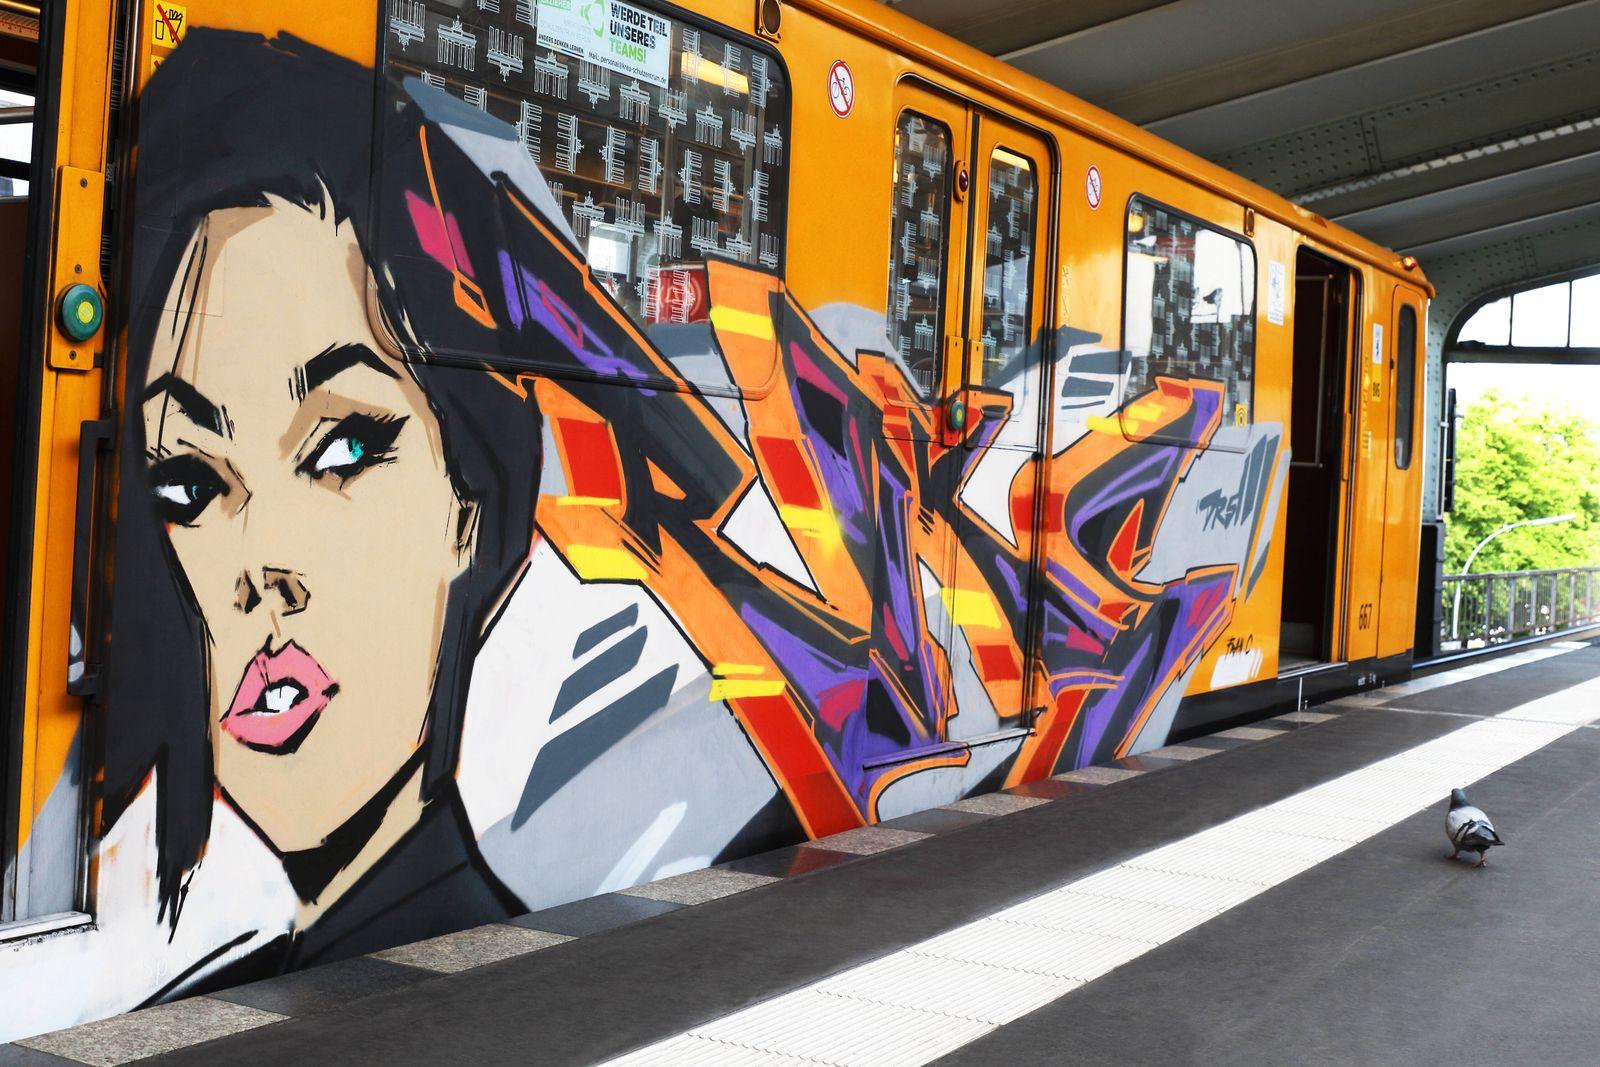 Graffiti am U-Bahnzug - Berlin, Deutschland, DEU, GER, 15.05.2020 - Berlin (Friedrichshain-Kreuzberg) Ein mit Graffiti b